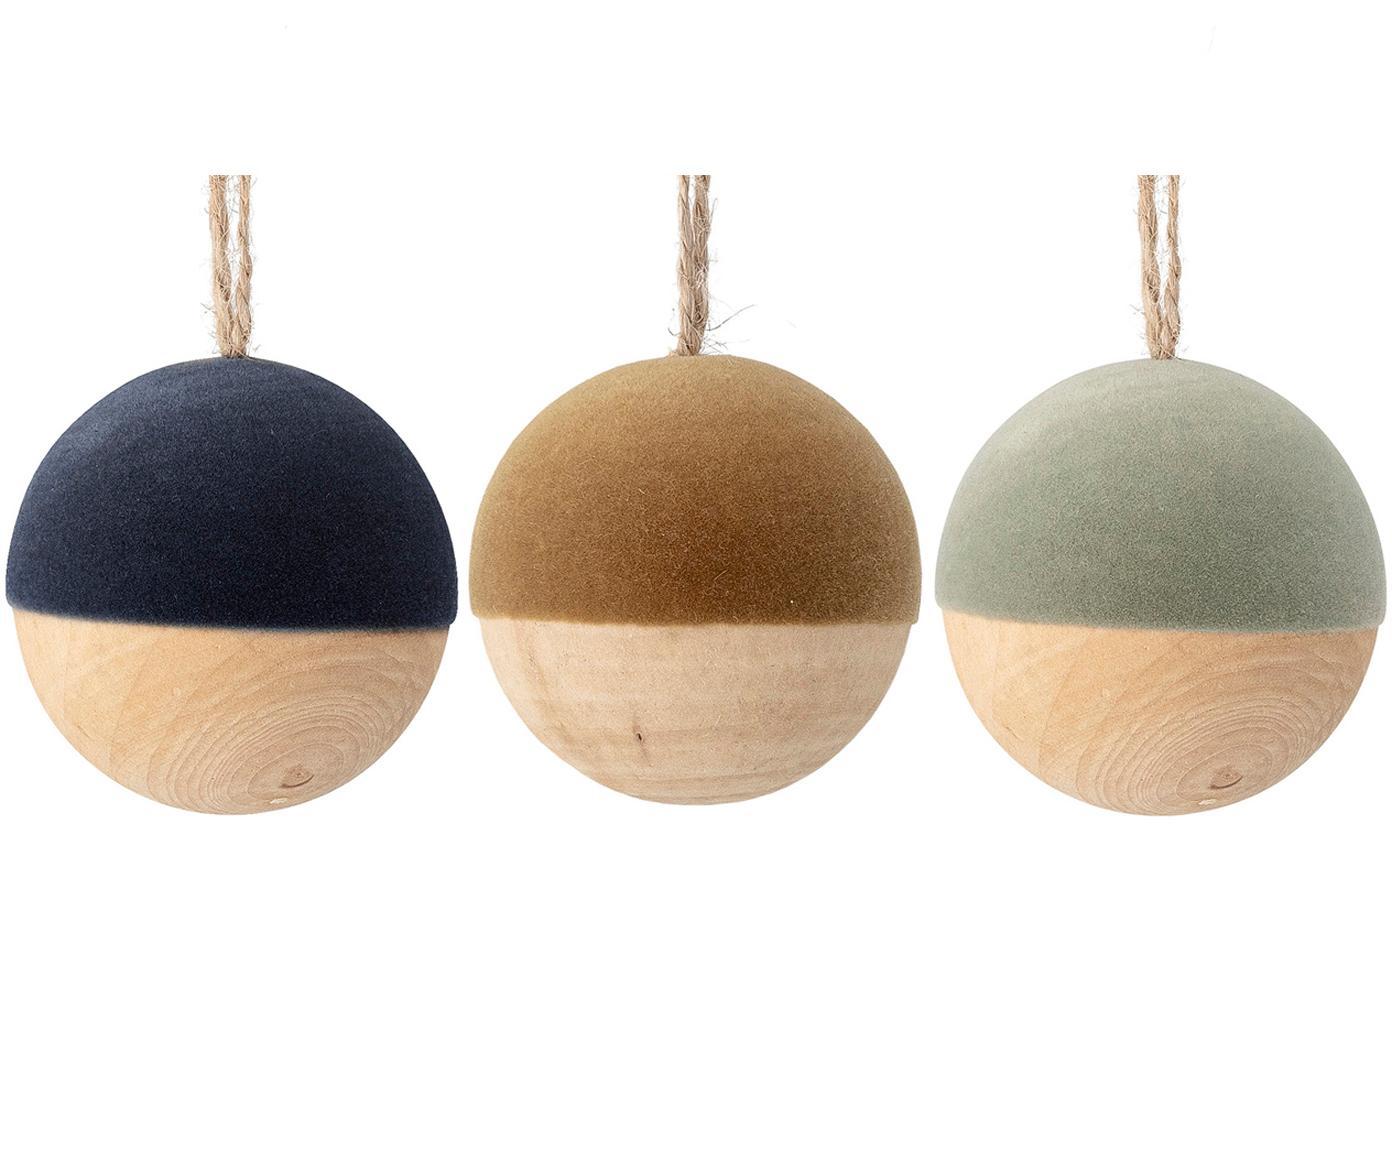 Fluwelen kerstballenset Thace, 3-delig, Hout, polyester fluweel, Donkerblauw, mosterdgeel, mintgroen, houtkleurig, Ø 5 cm